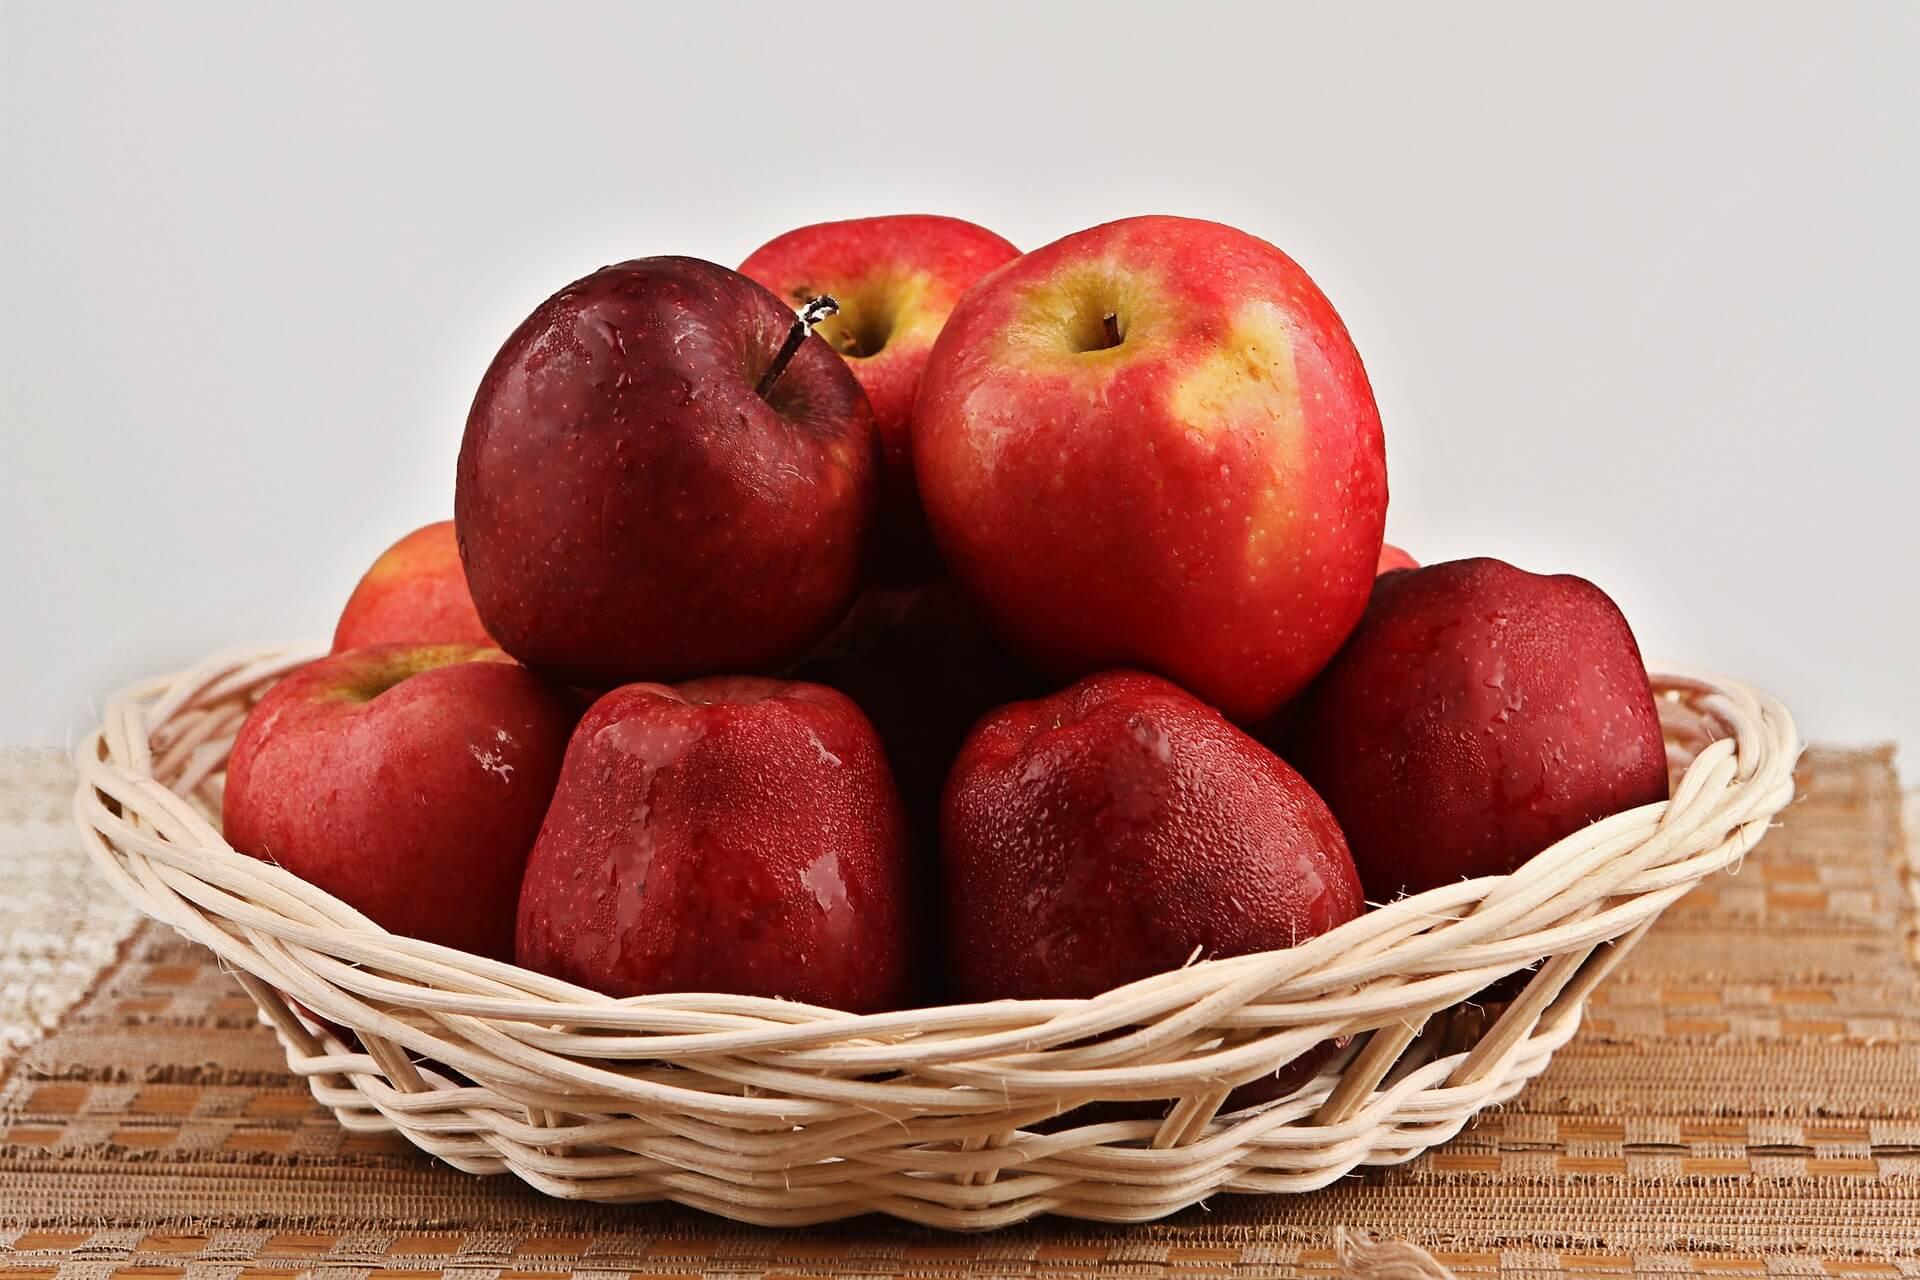 Apples to help combat constipation